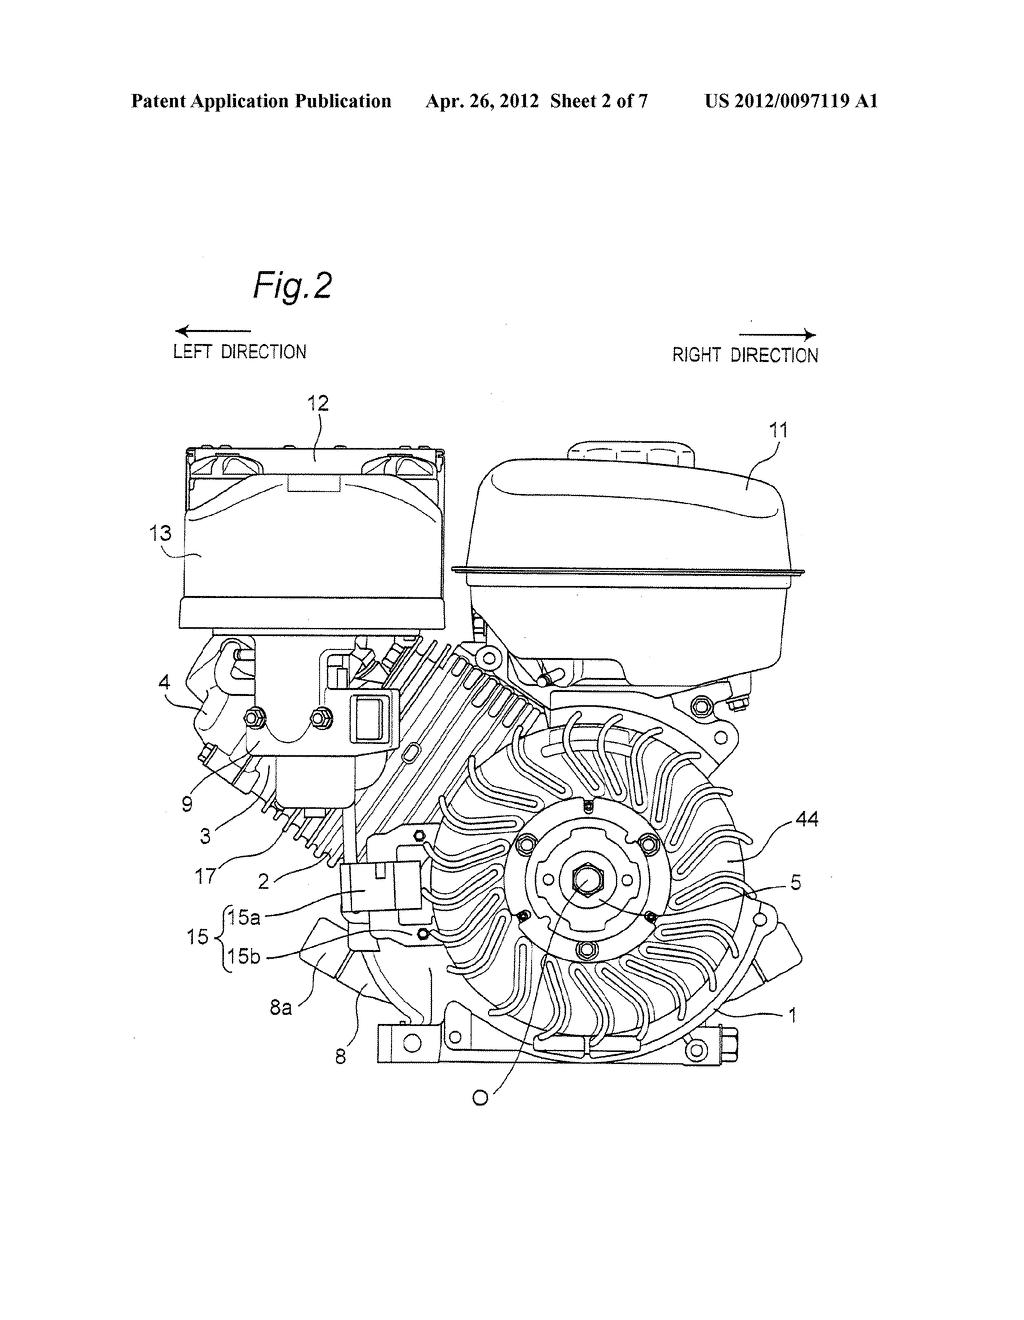 Wiring Manual PDF: 1500cc Vw Engine Diagram